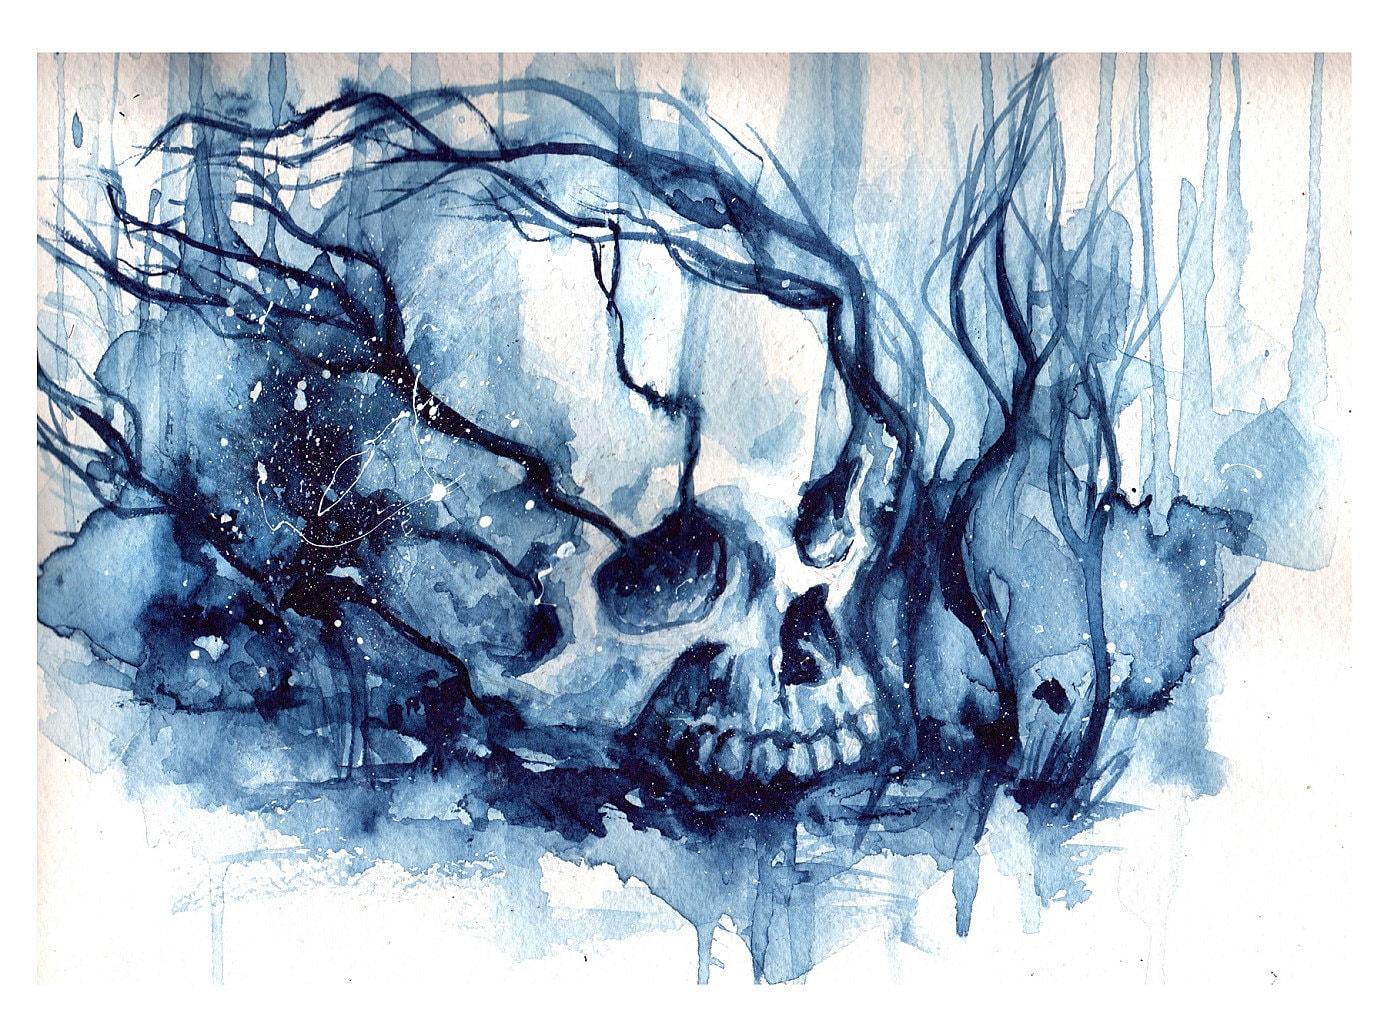 Blu Winter Skull Watercolor On Paper